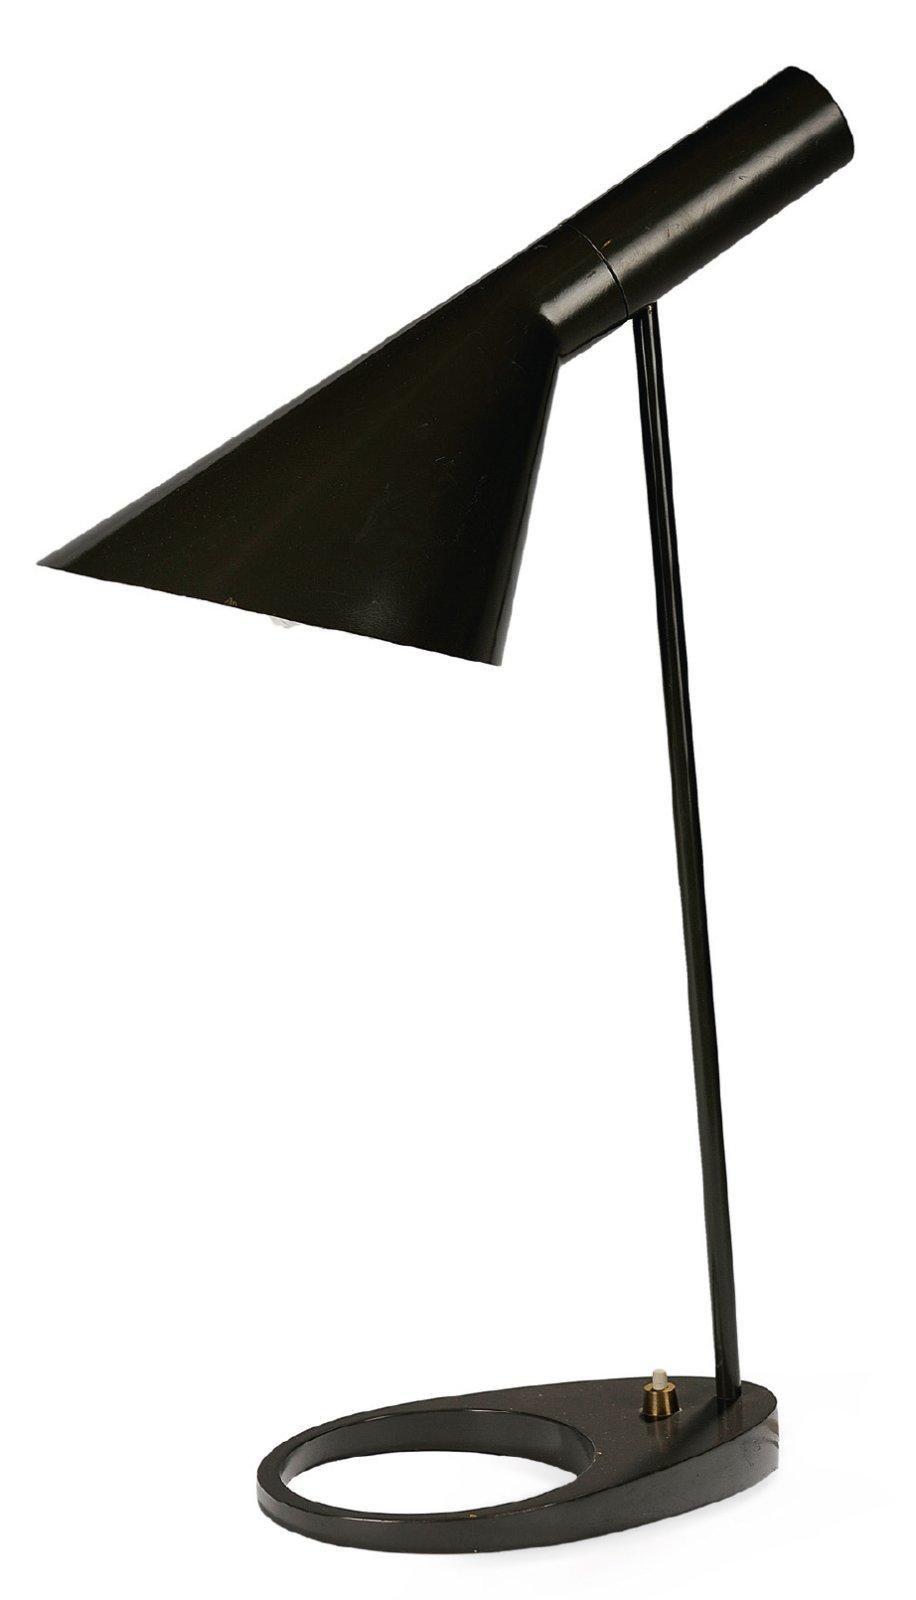 AJ Vizier by Arne Jacobsen 1957 | Lamps | Pinterest | Arne jacobsen ...